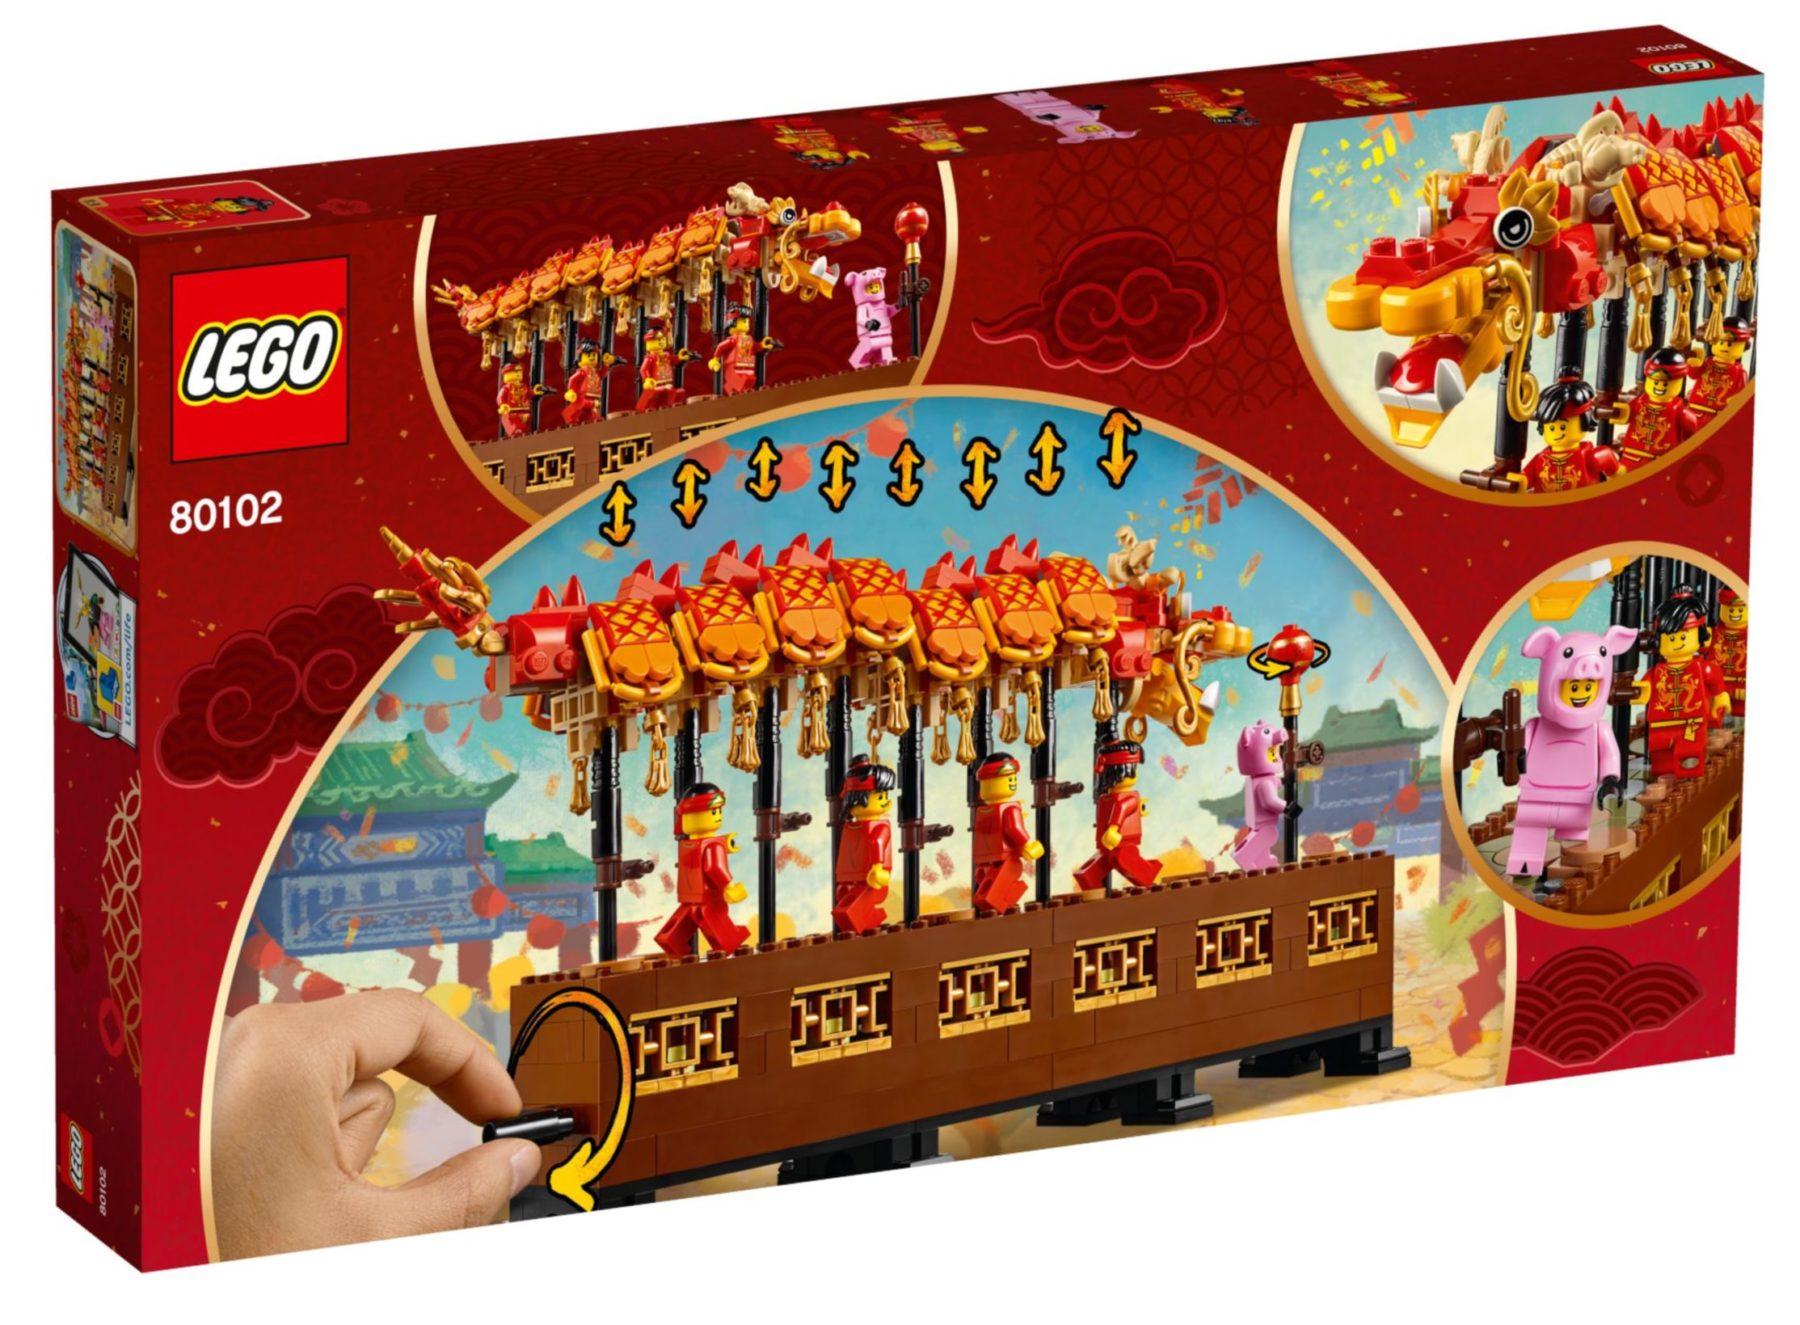 LEGO 80102 Dragon Dance Box